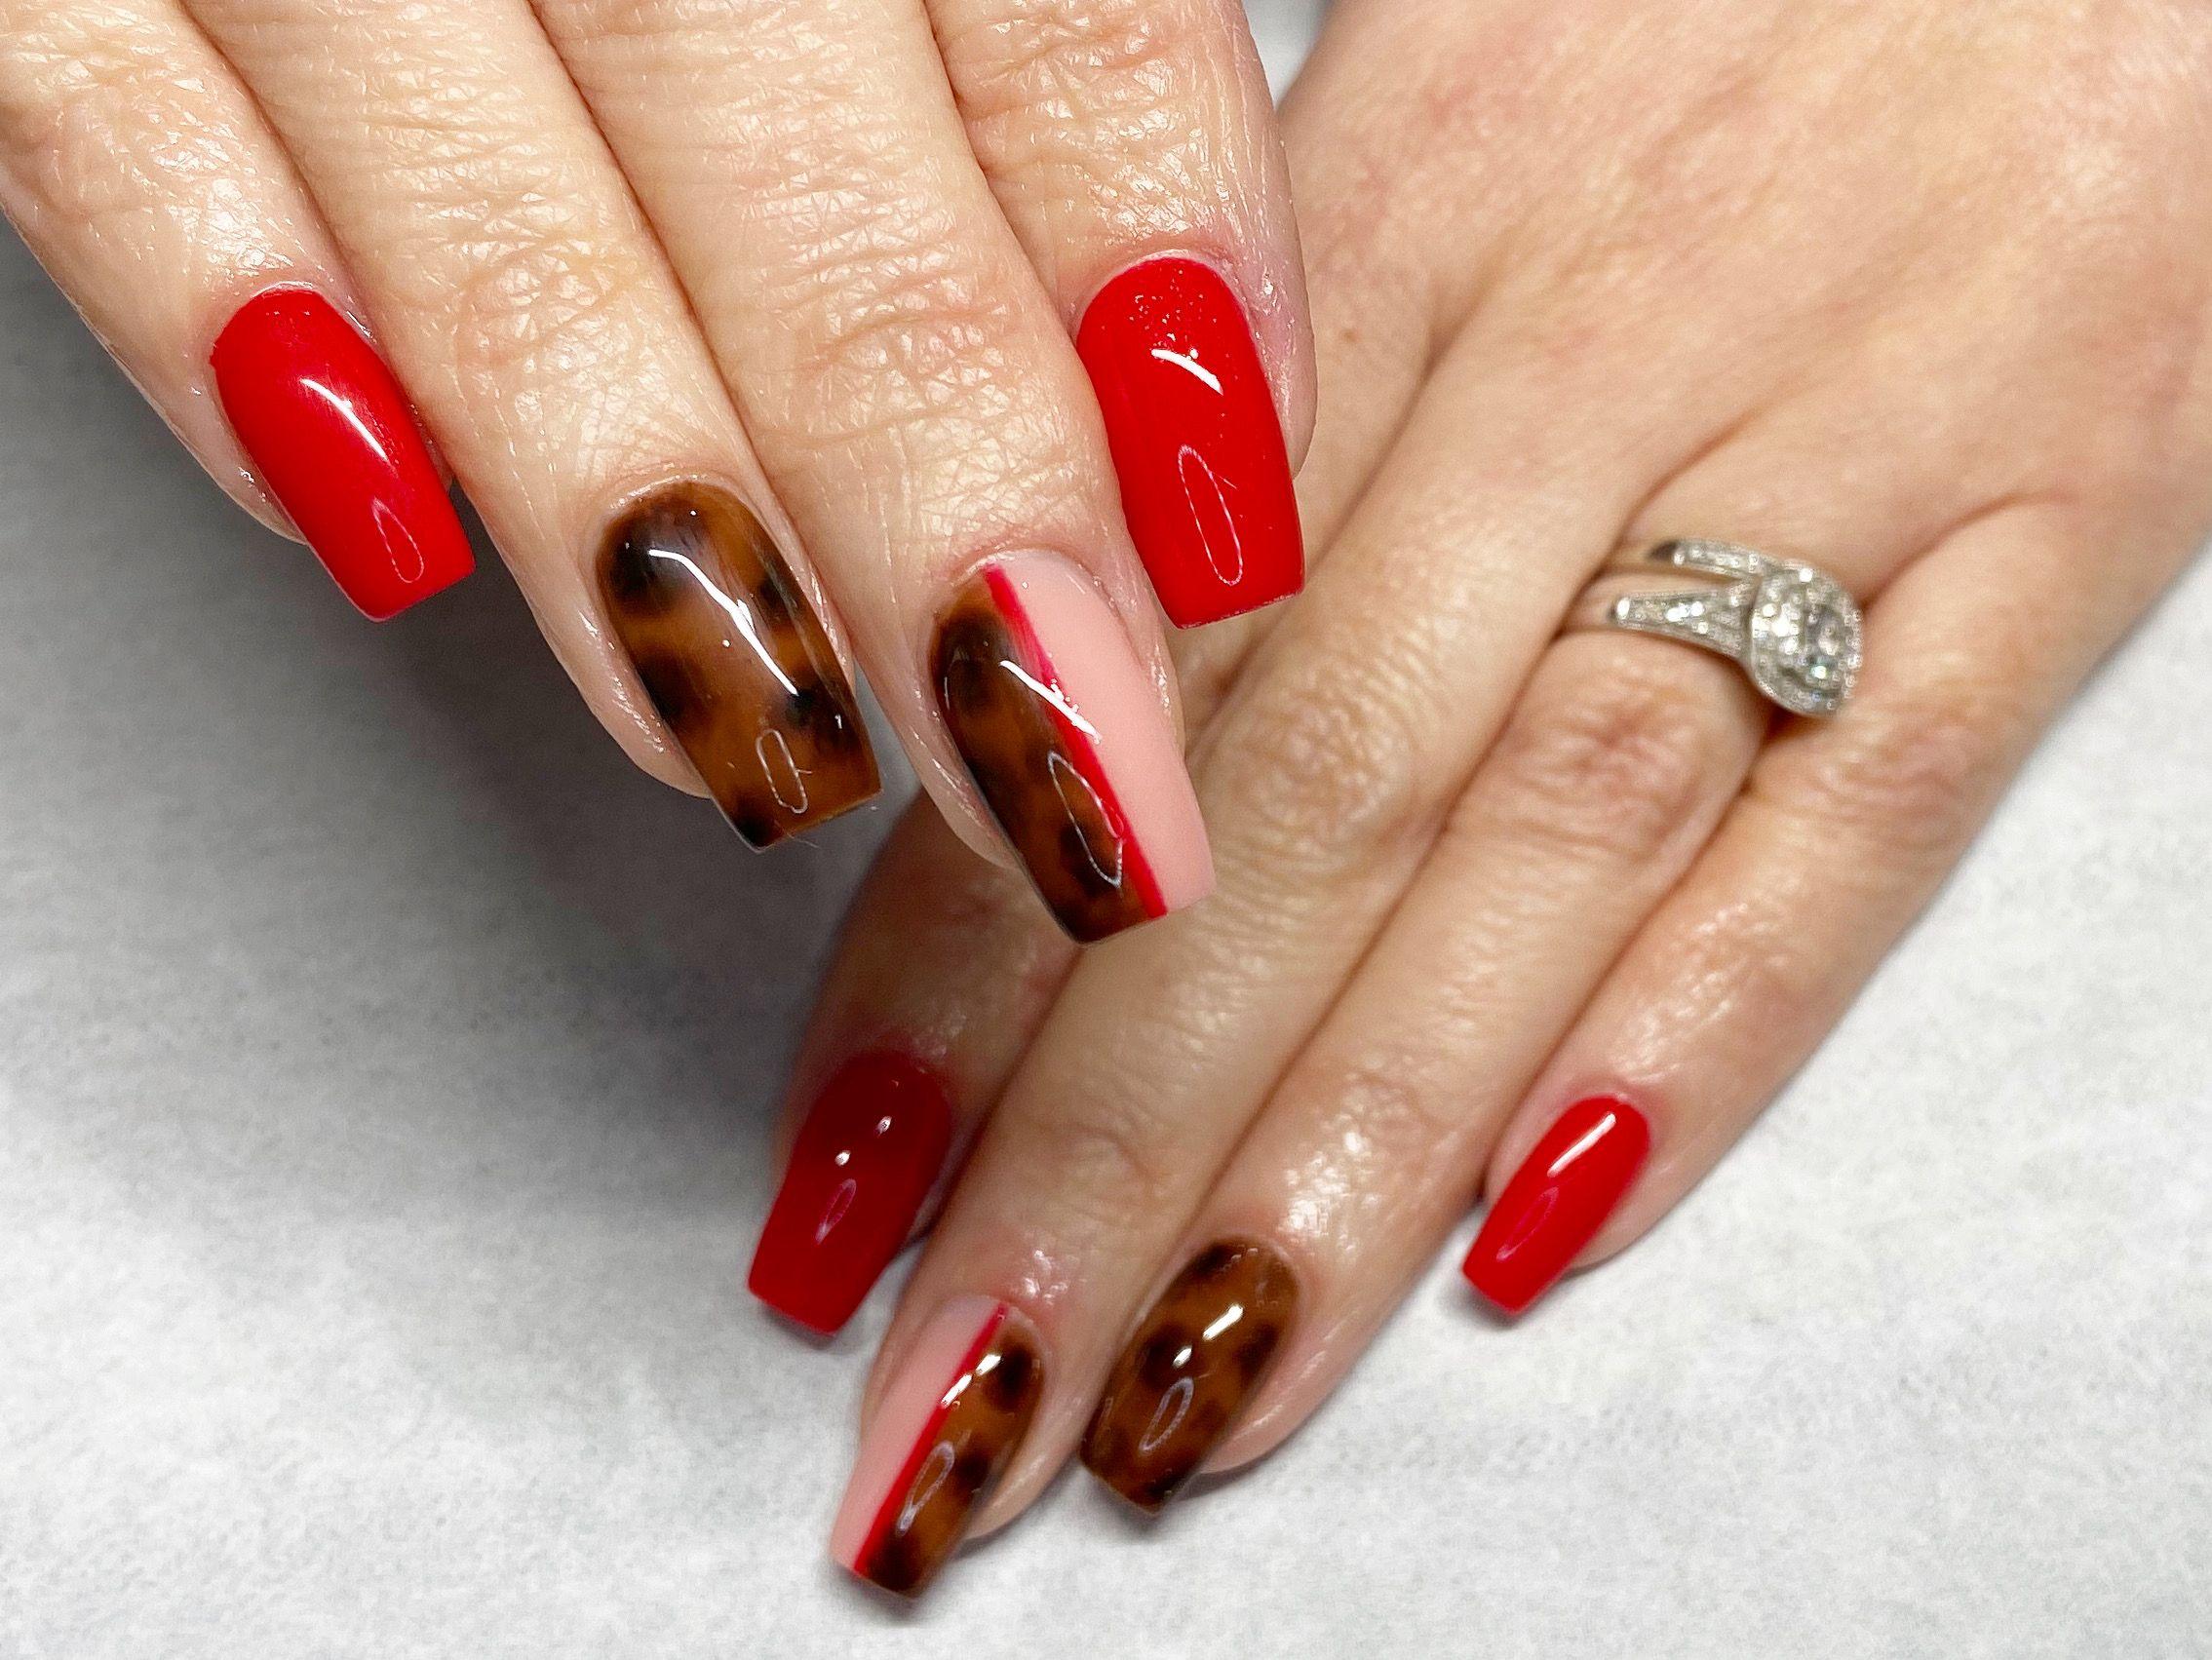 Red nails with tortoise shell design  #nails #thegelbottle #biab #nailtech #nailsbybeff #Staffordshire #biddulph #cheshire #nailart #love #fashion #nailtechnician #scratchmagazine  #nailaddict #nailpro #showscratch #polish #nailfie #nailartist